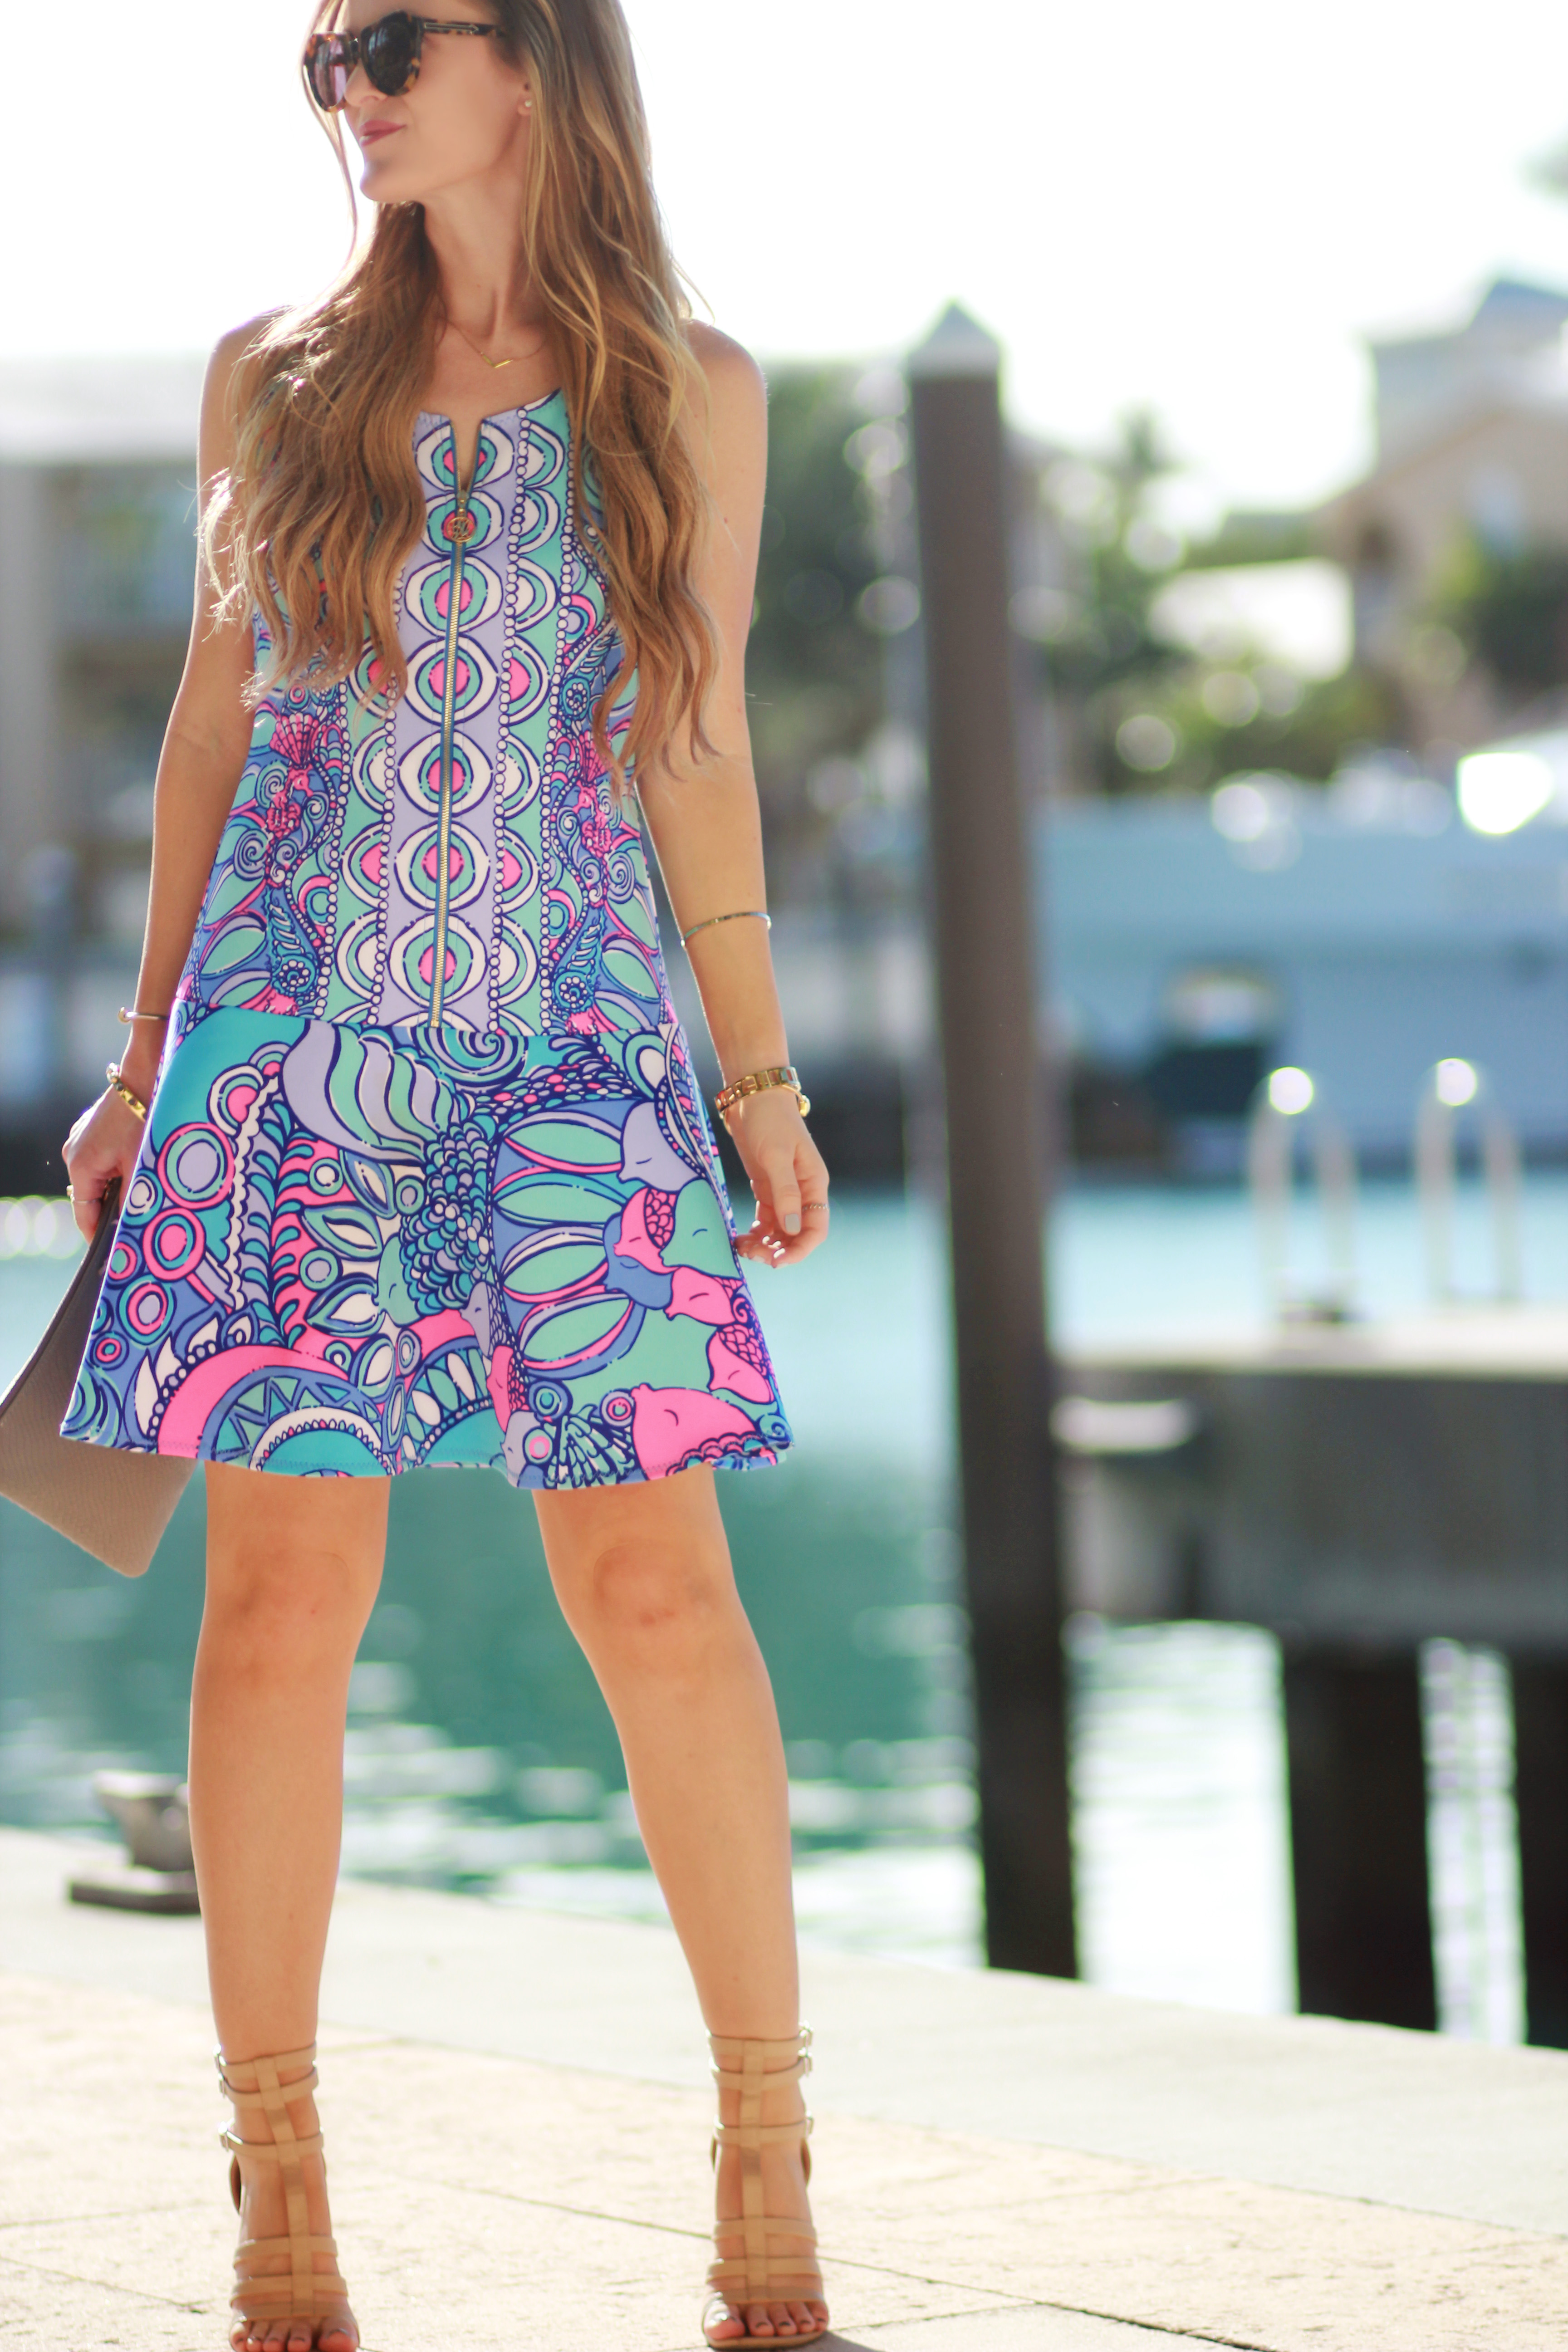 Vacation Outfit | Upbeat Soles | Orlando Florida Fashion Blog